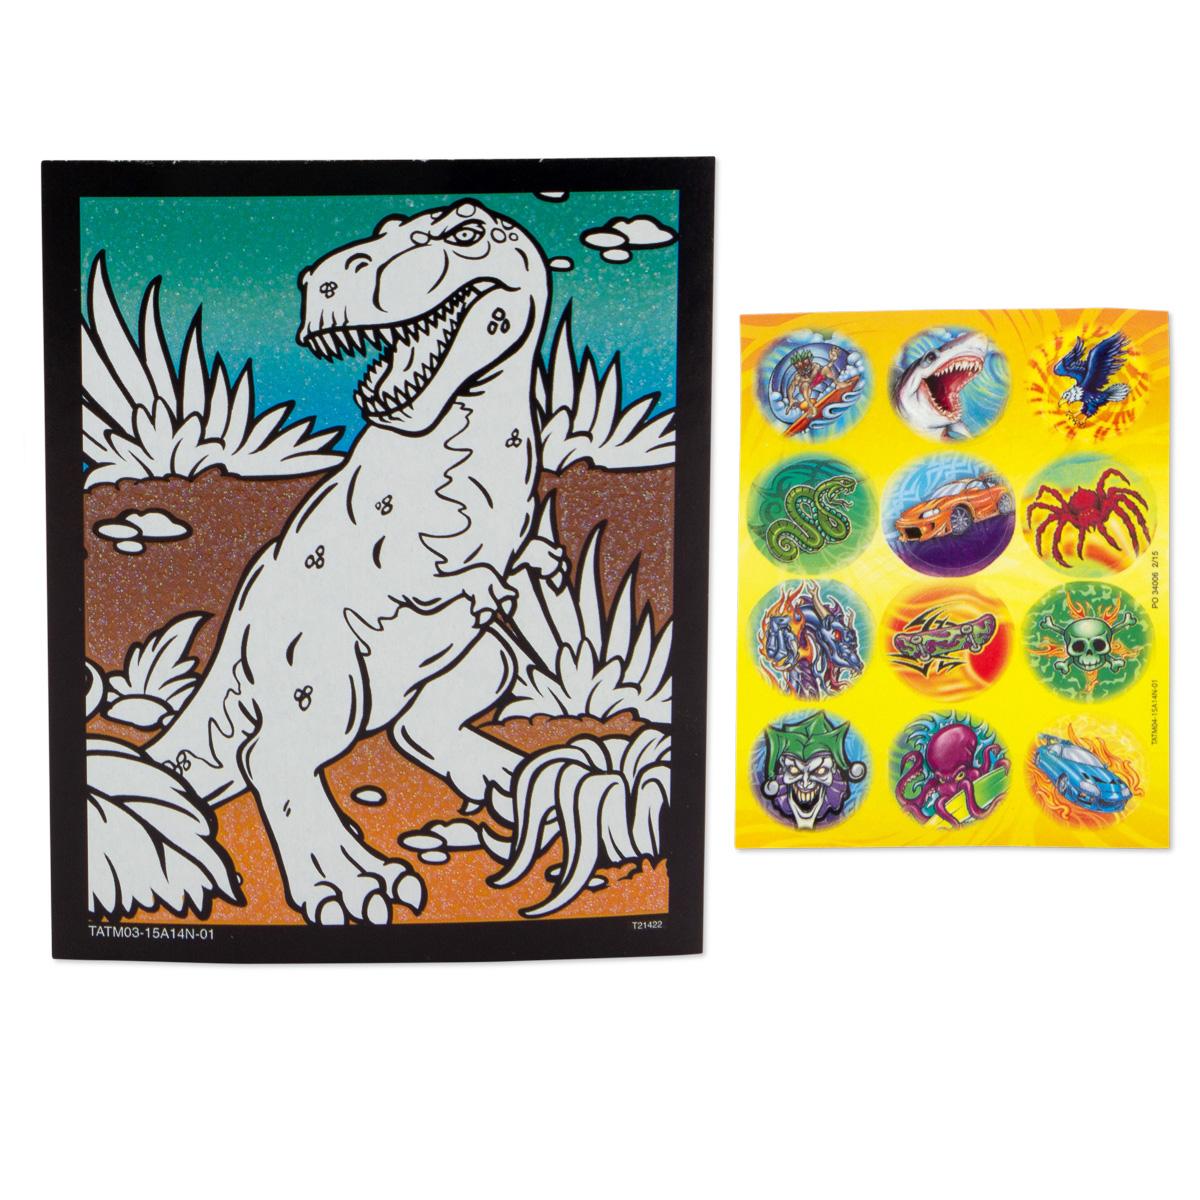 Savvi-Kids-Activity-Kit-Markers-Tattoos-Stickers-amp-More thumbnail 11